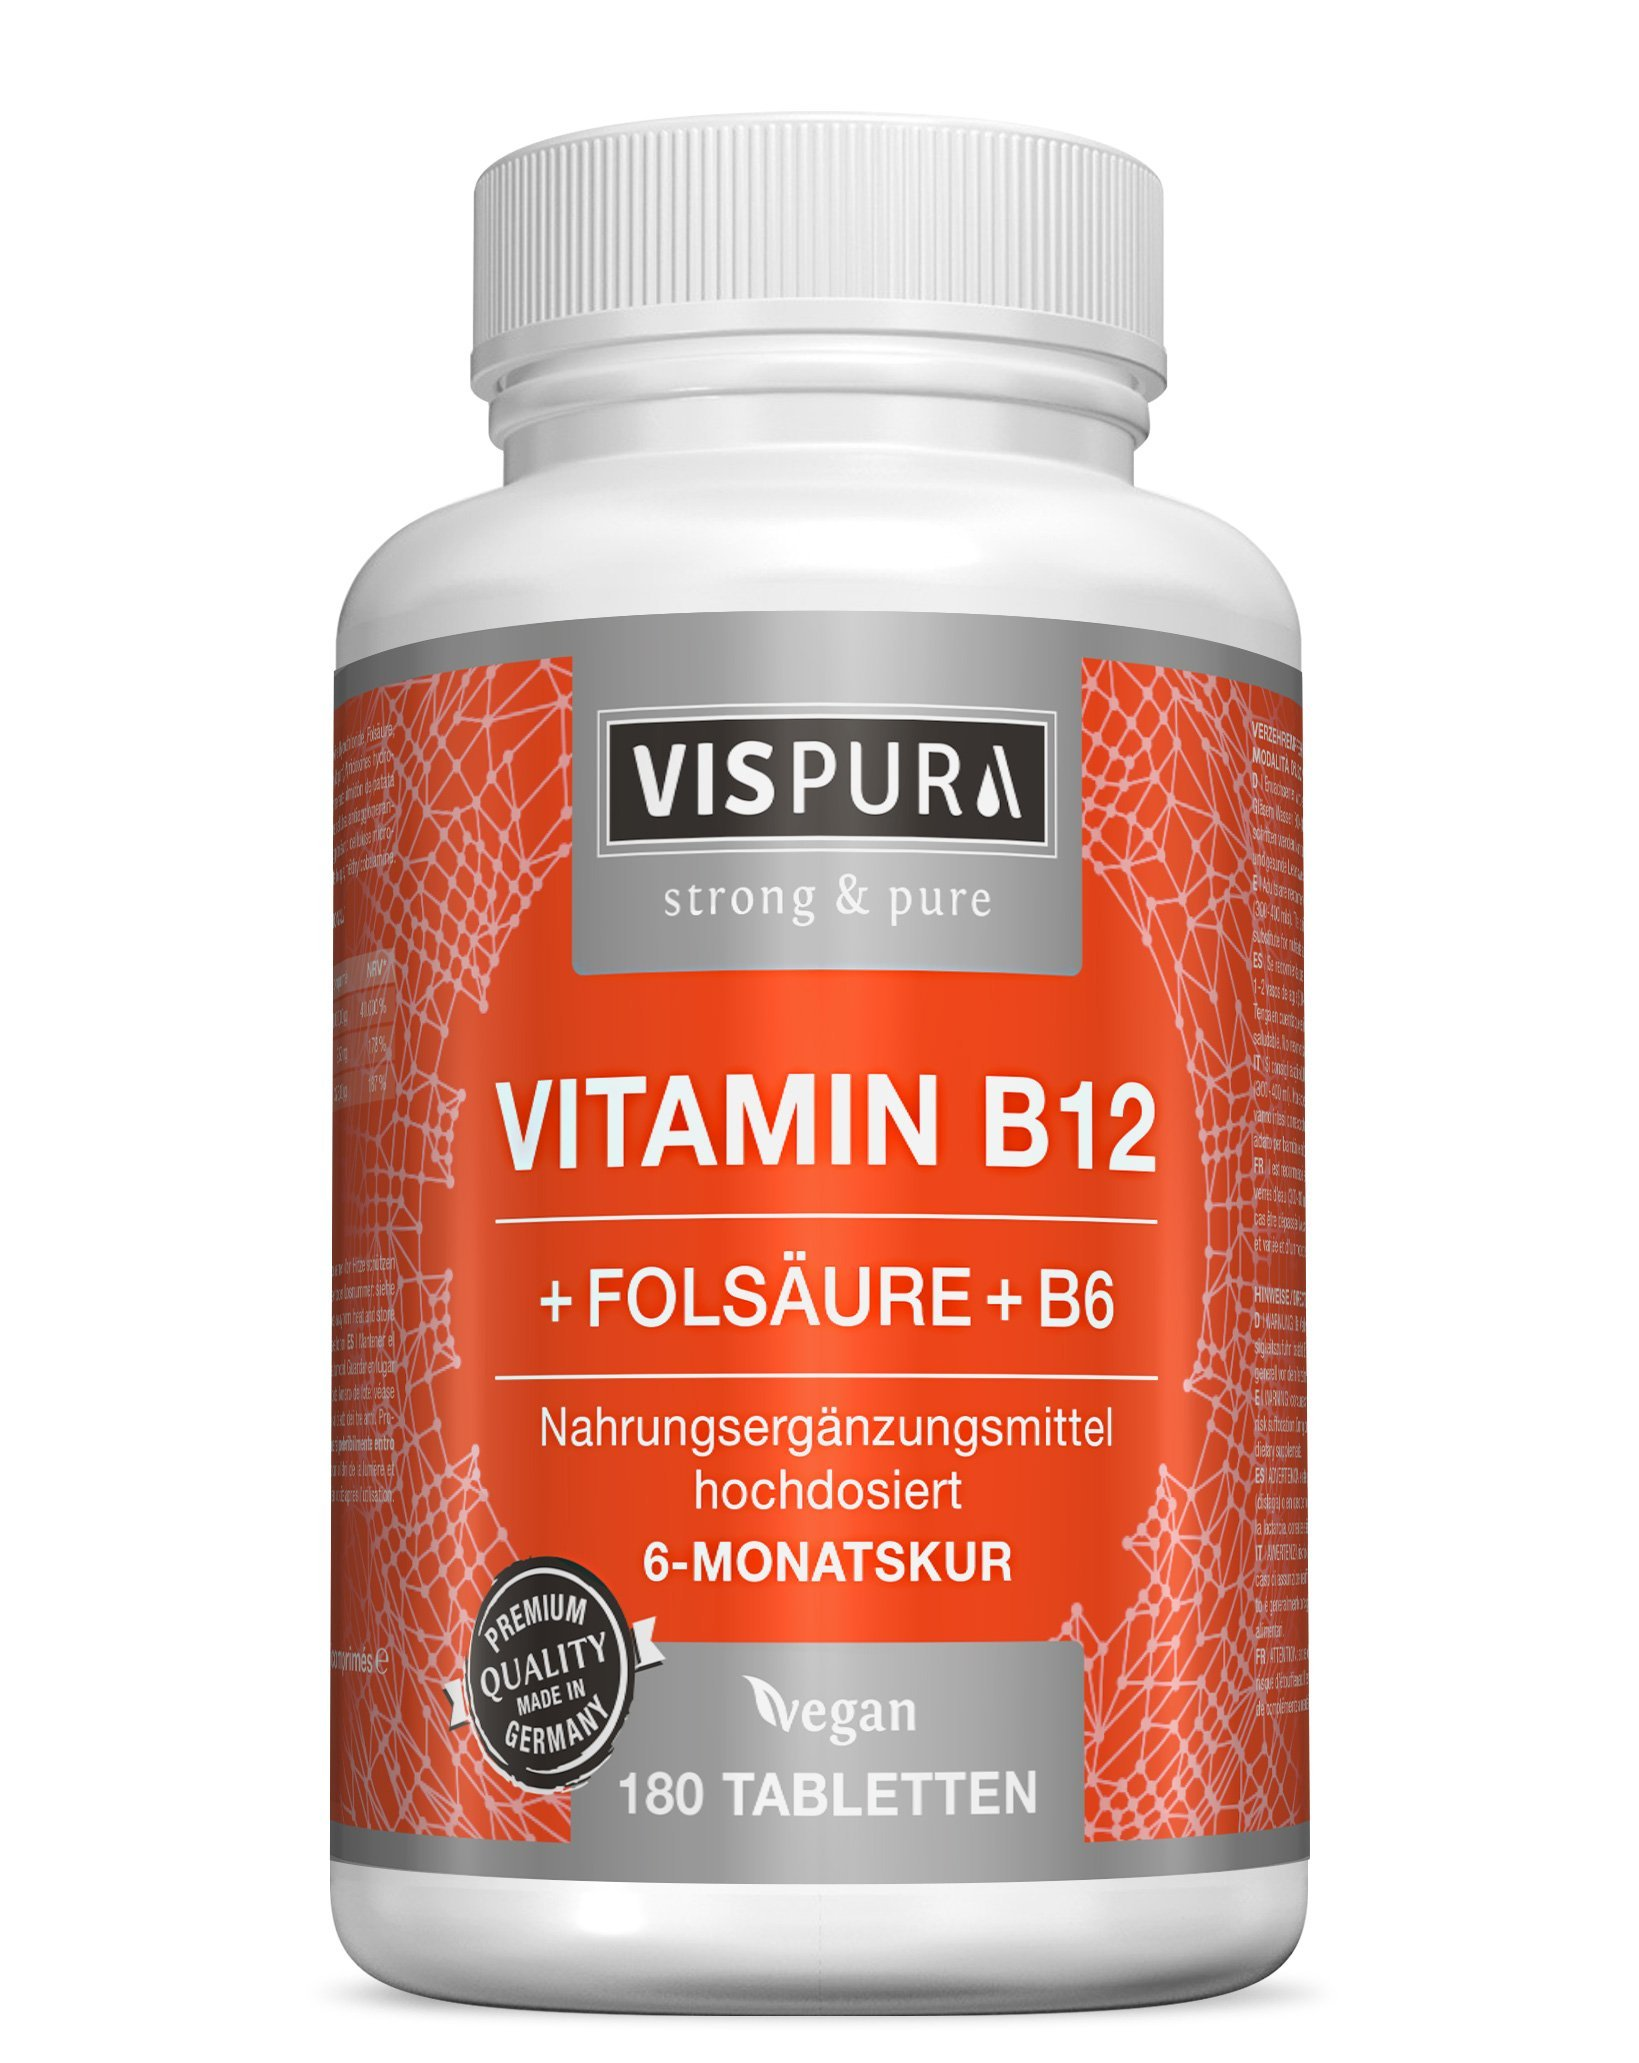 Vitamina B12 altamente concentrada, 1000 µg con fórmula VITAL + vitamina B6 metilcobalamina, 180